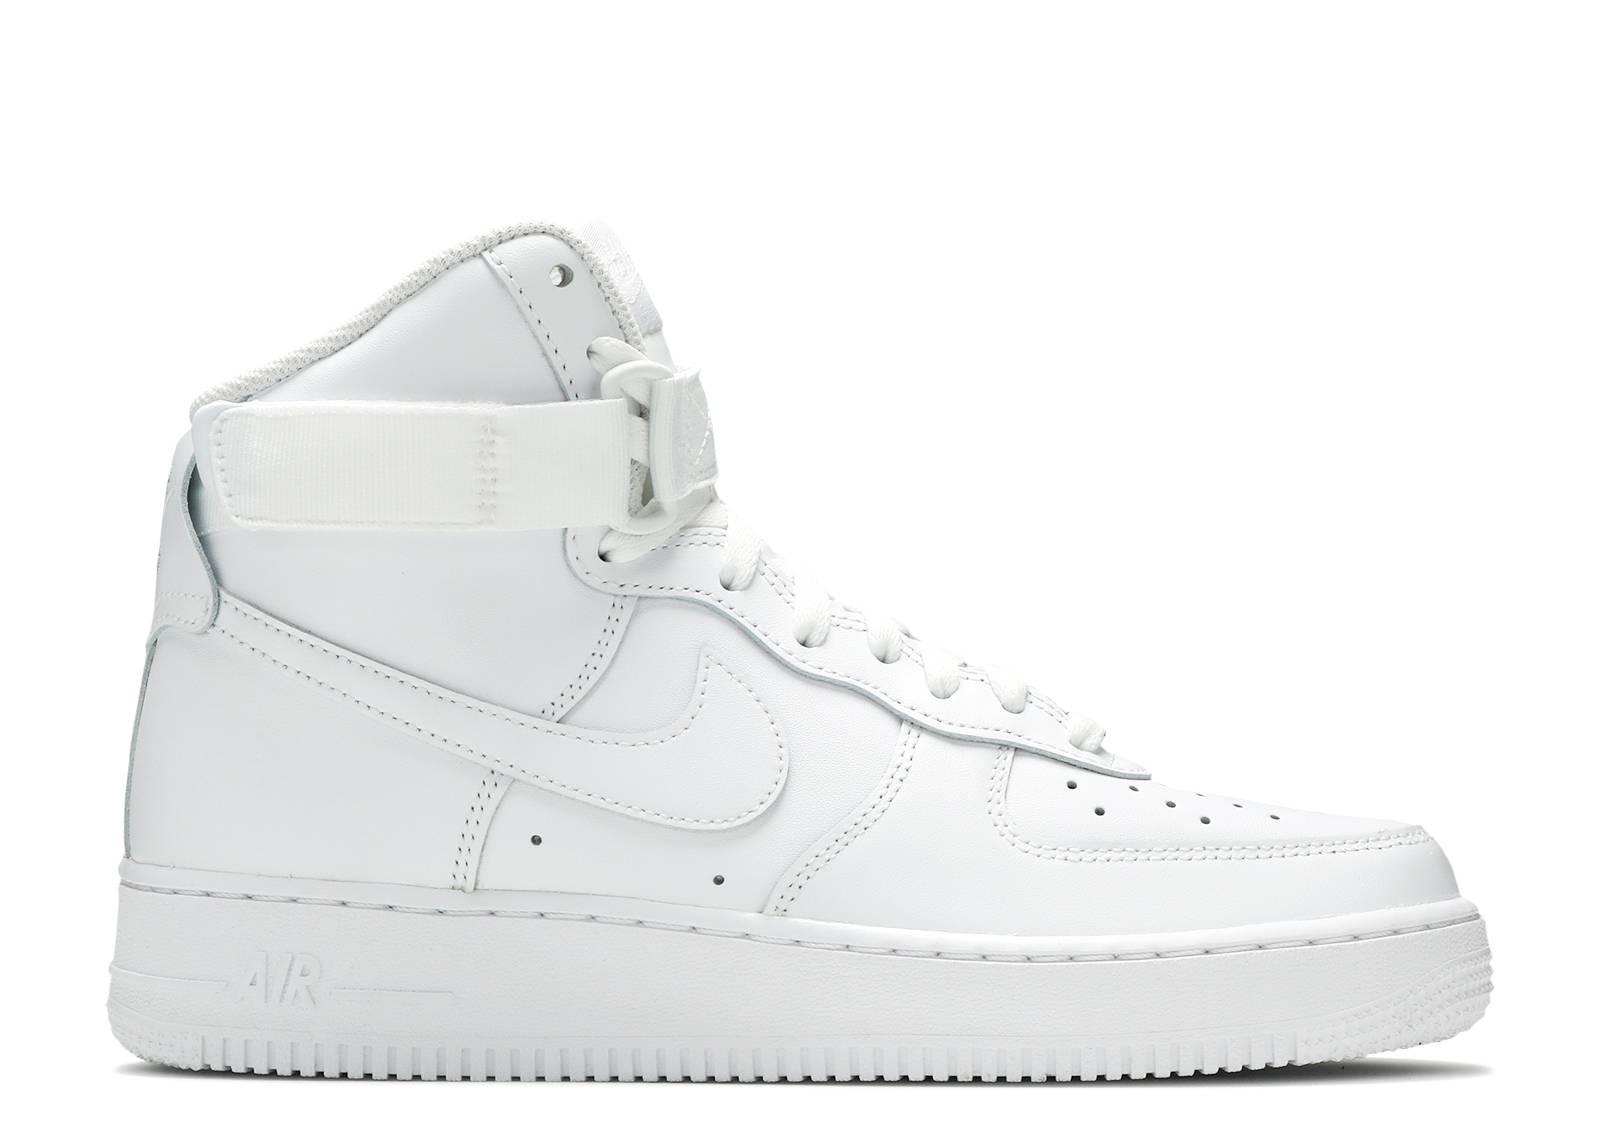 Nike Air Force 1 High Sneakers   Flight Club